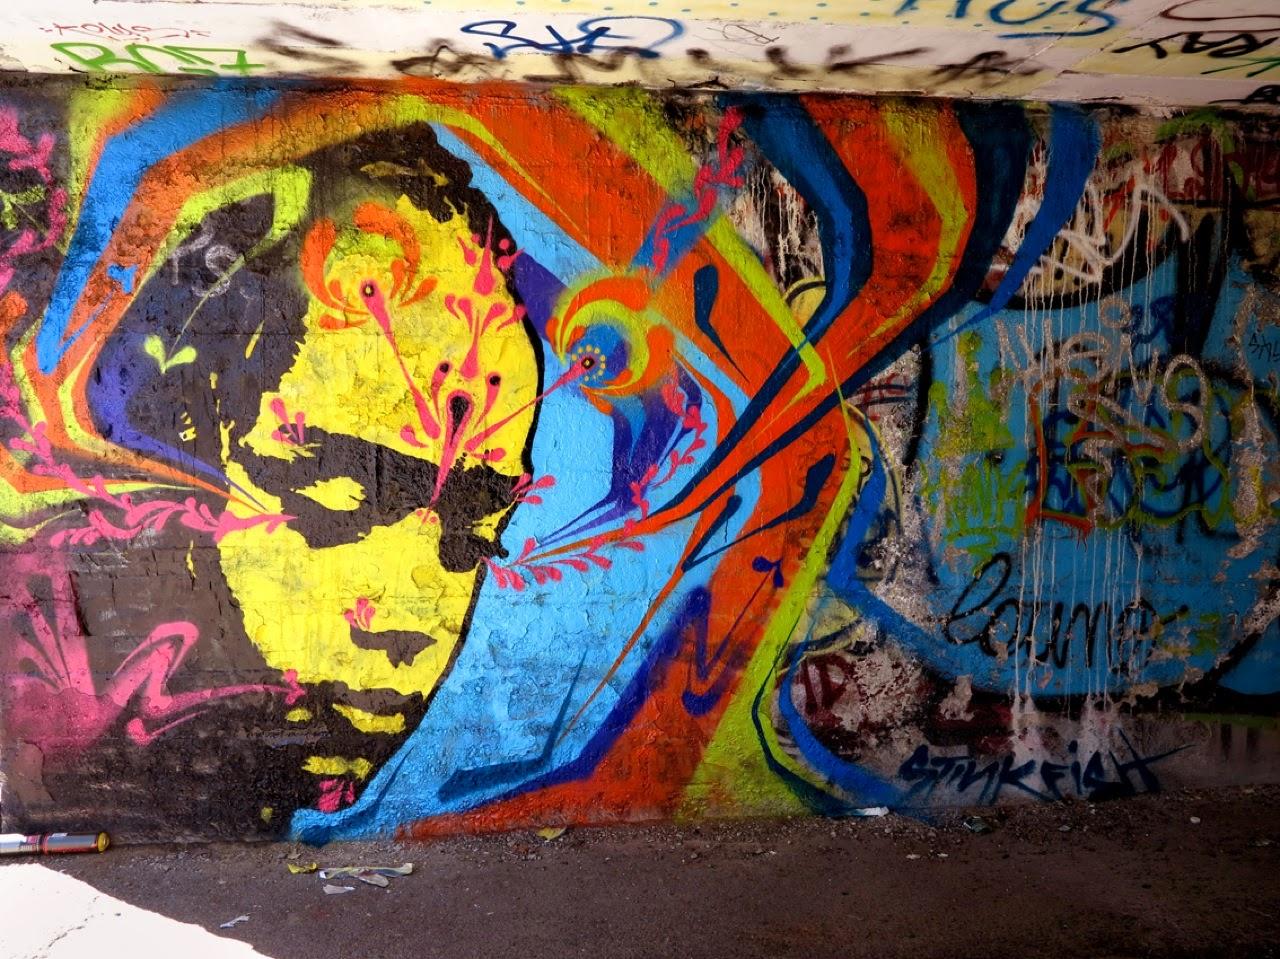 Art Pieces Stinkfish New Street Art Pieces India Cuba Italy Streetartnews